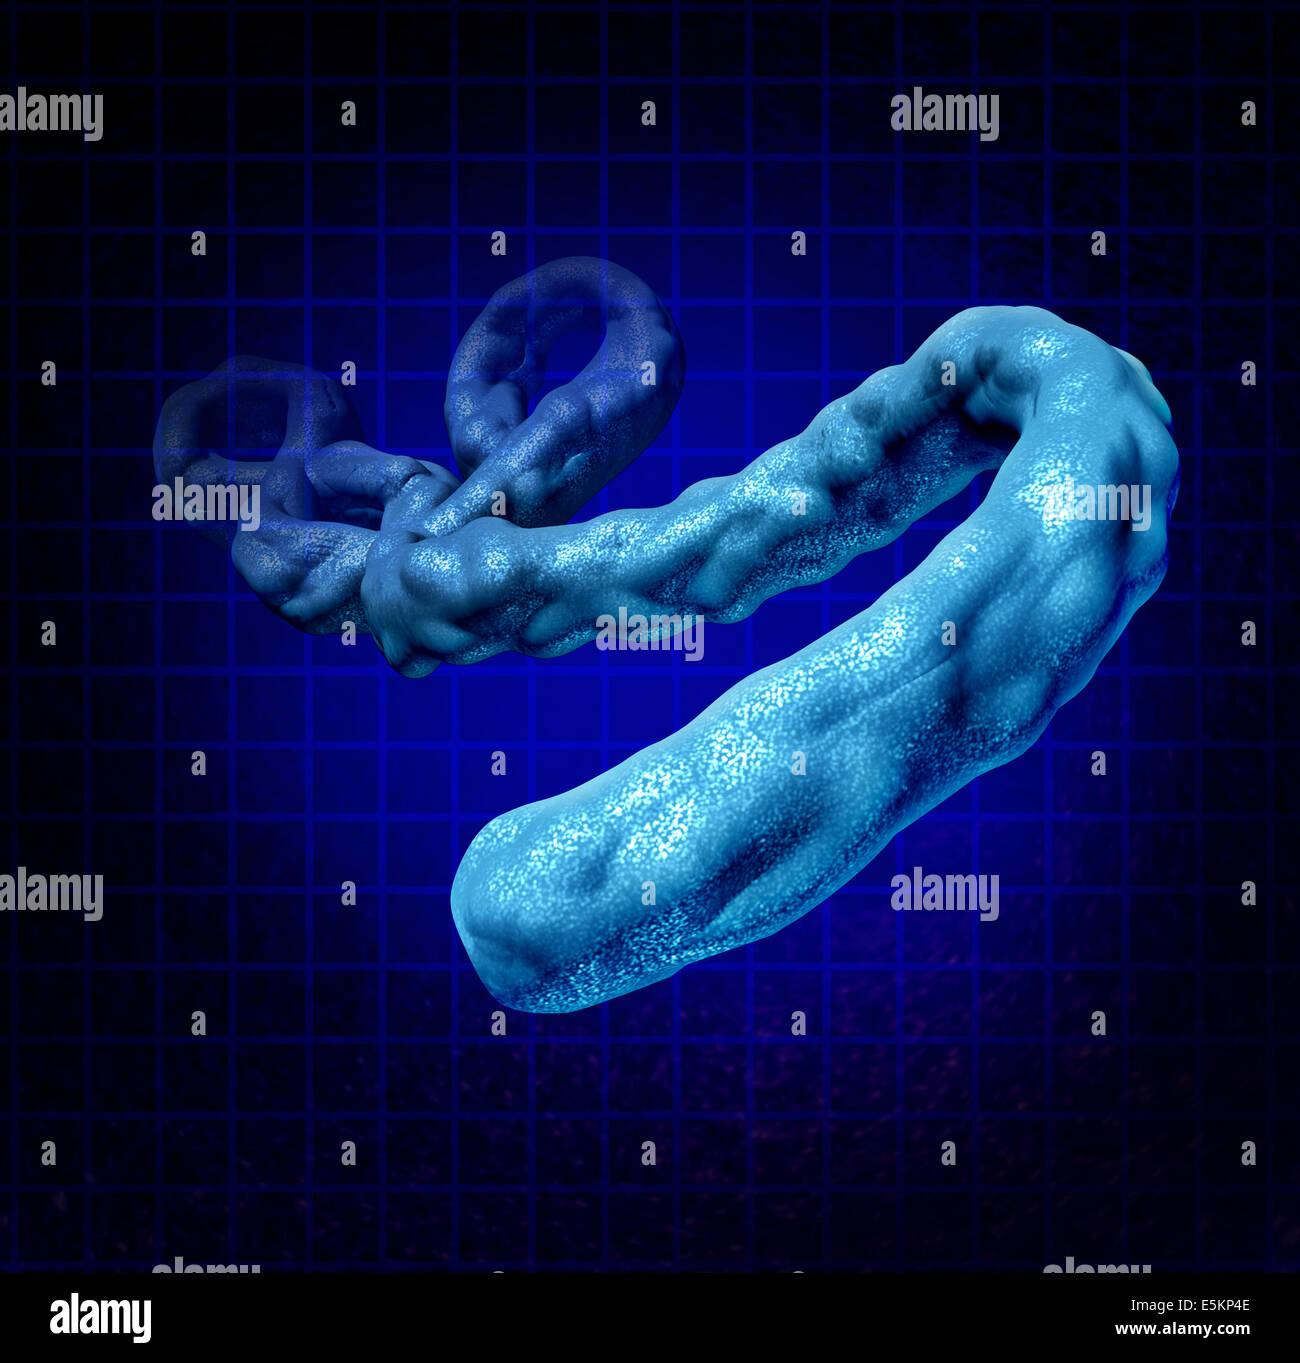 Ebola virus disease medical concept as a three dimensional dangerous microbe causing symptoms as hemorrhagic fever - Stock Image